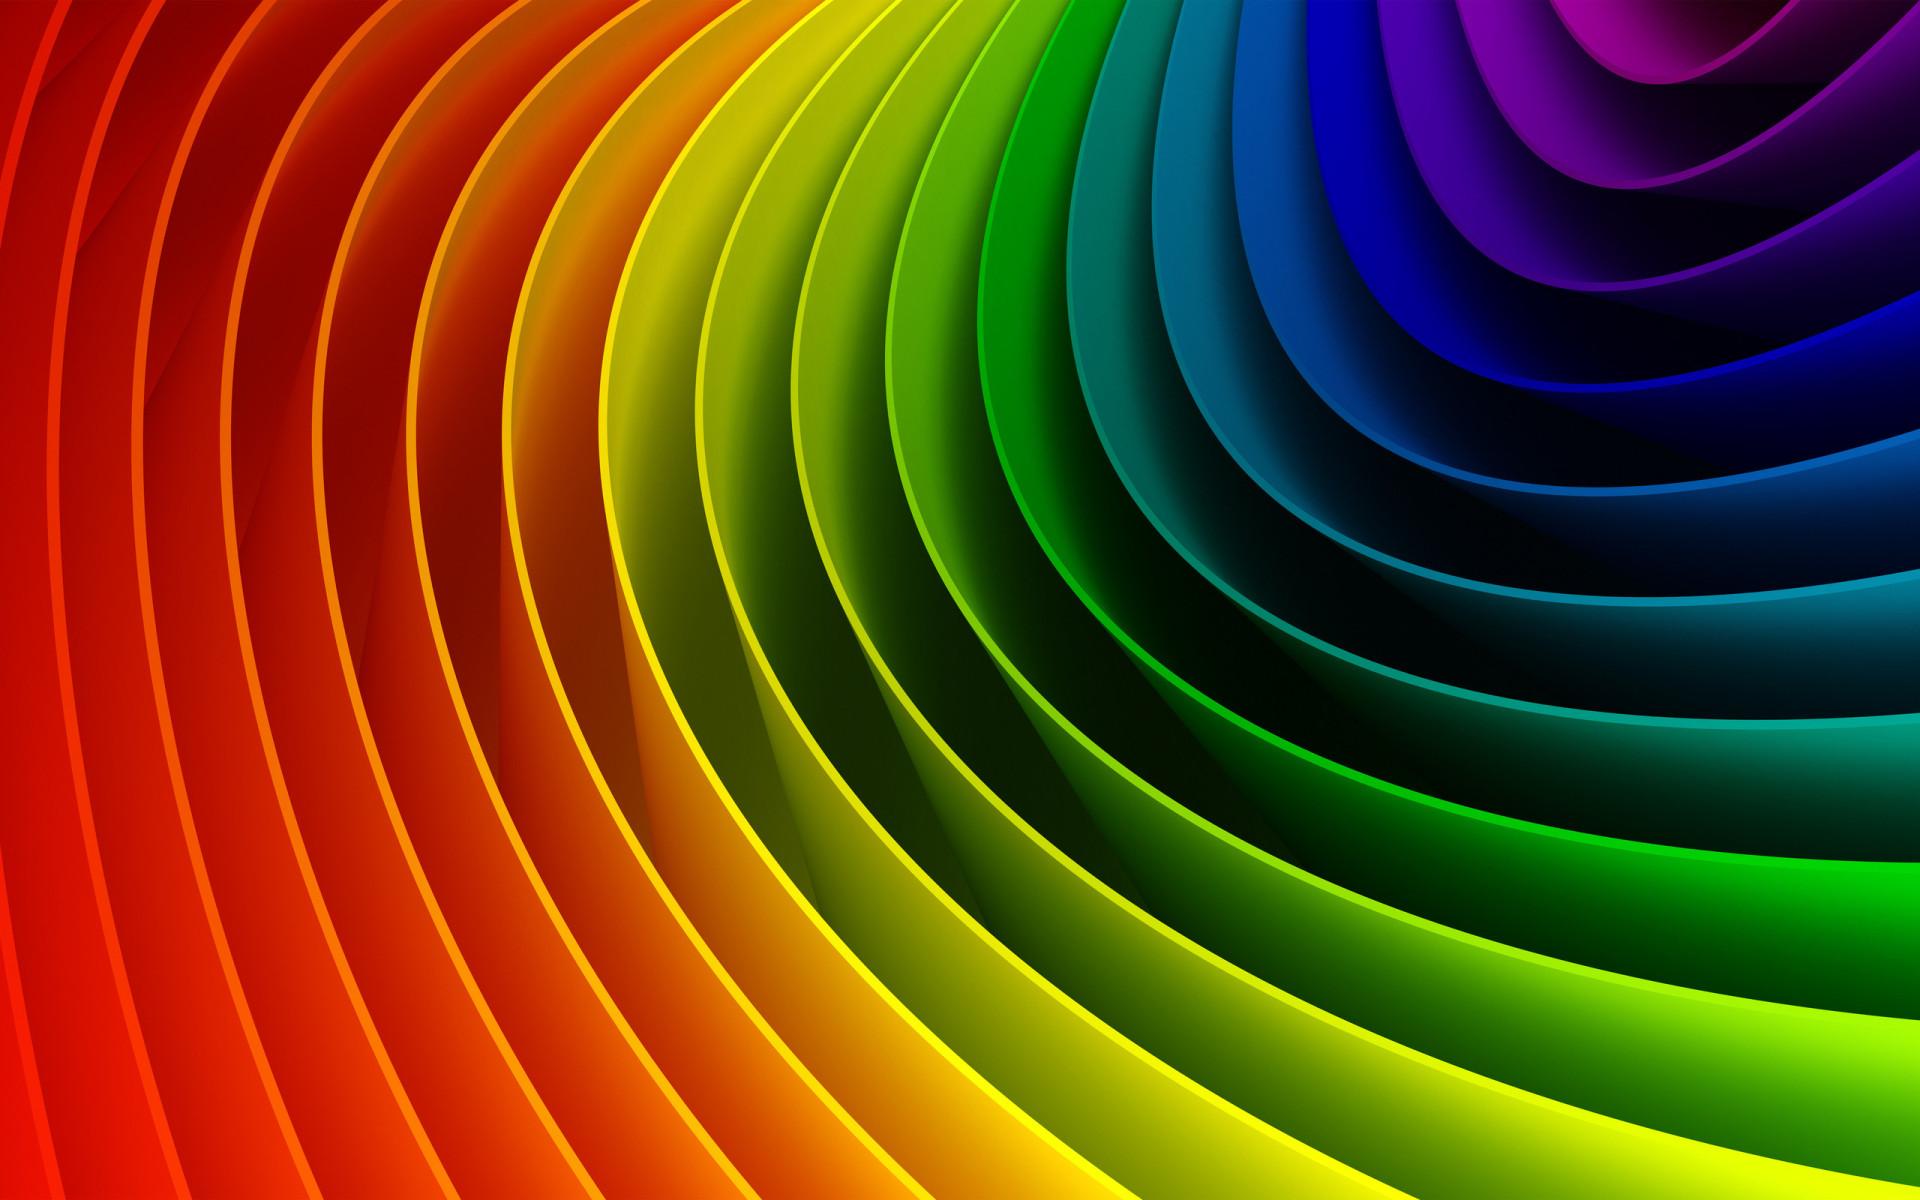 neon colored backgrounds wallpapersafari